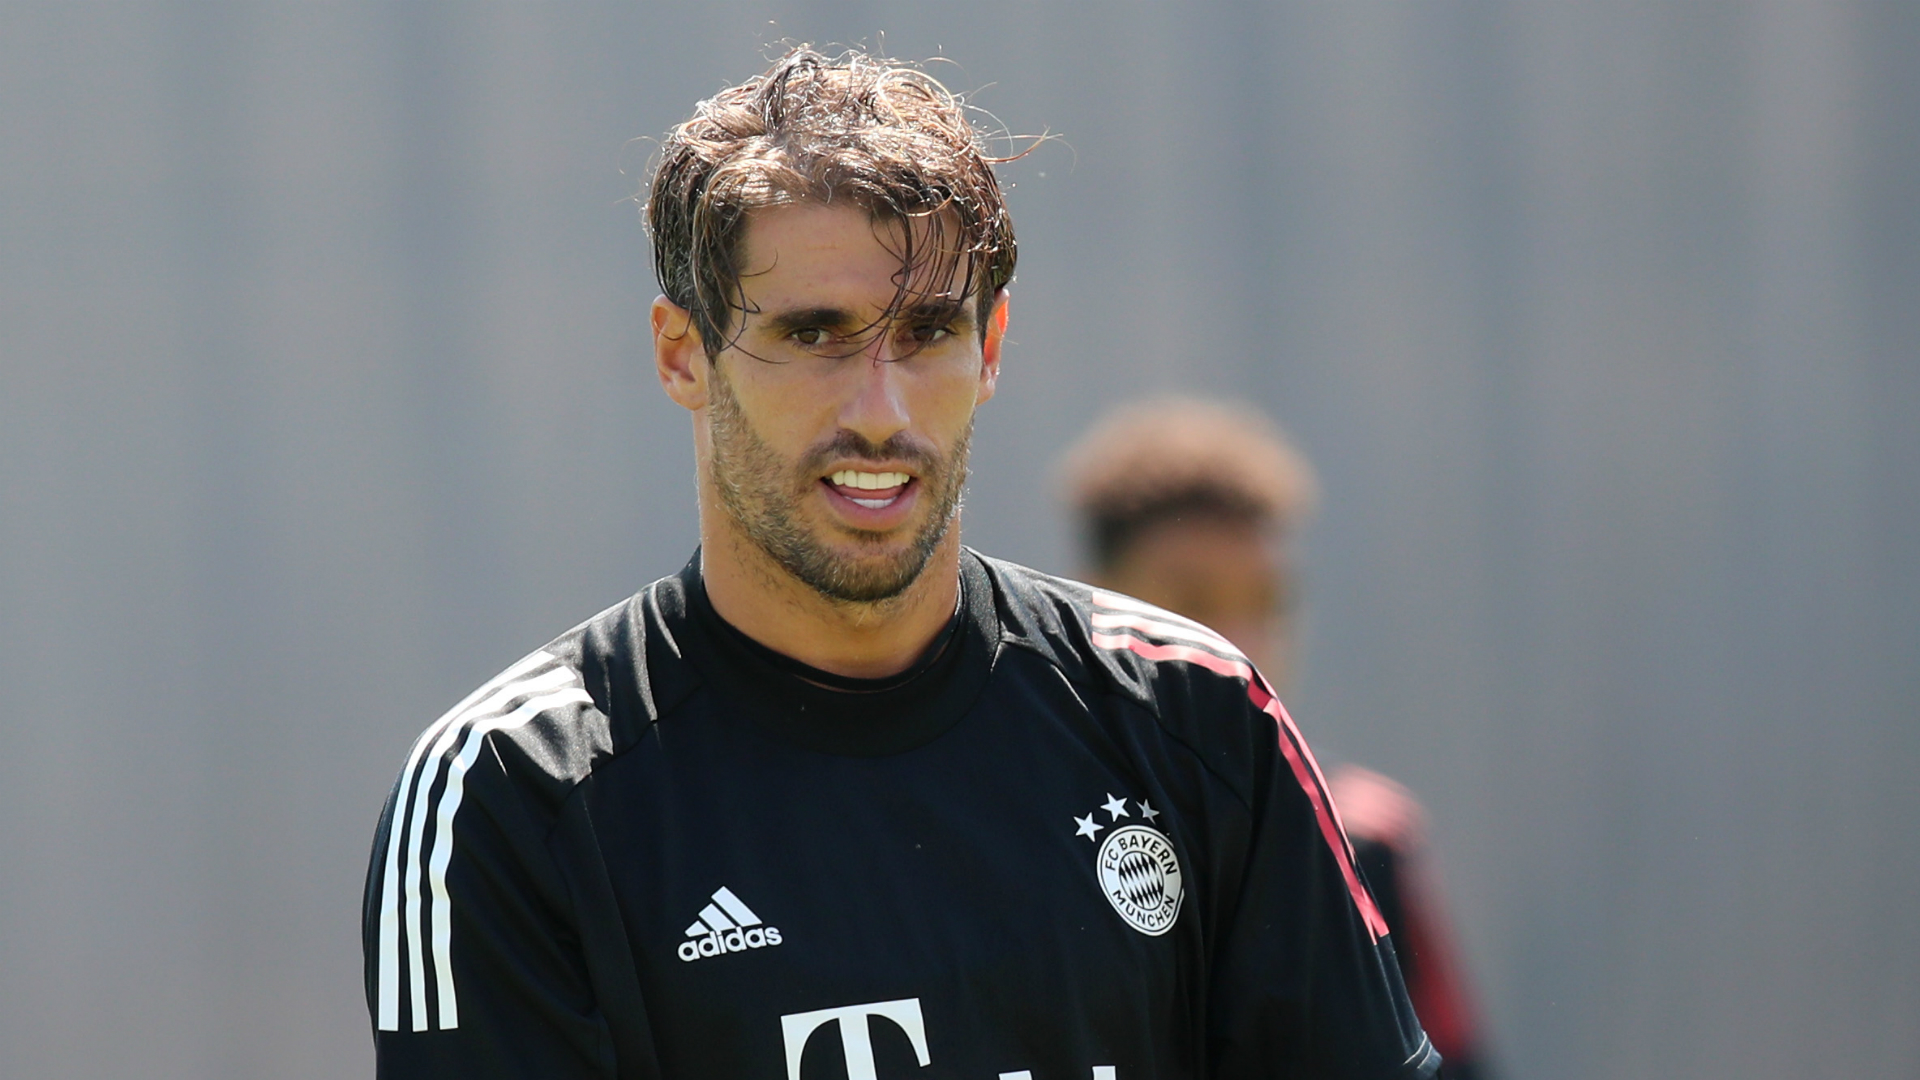 Martinez looking to leave Bayern Munich, Rummenigge confirms